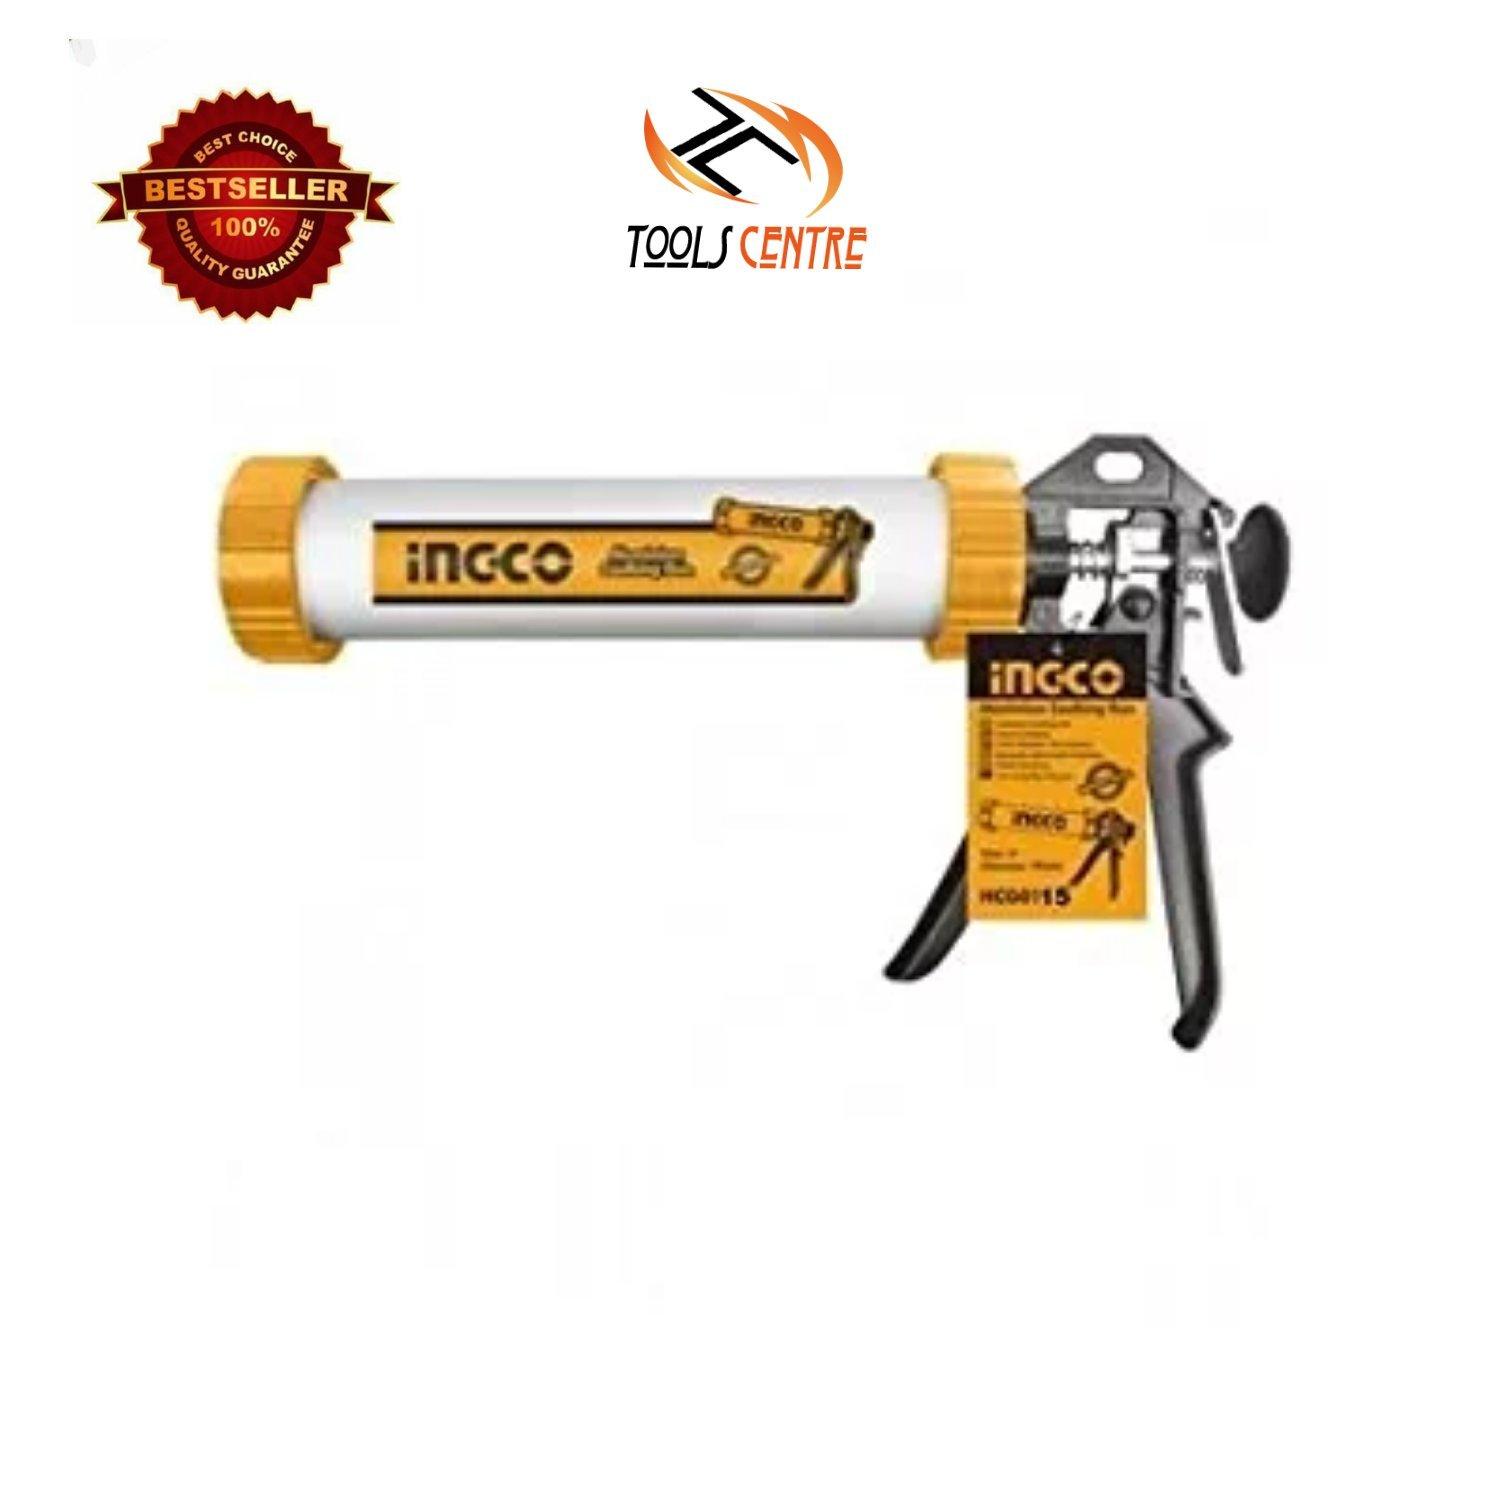 Tools Centre 15'' large Aluminium Silicon Gun For Home Handyman & Professional